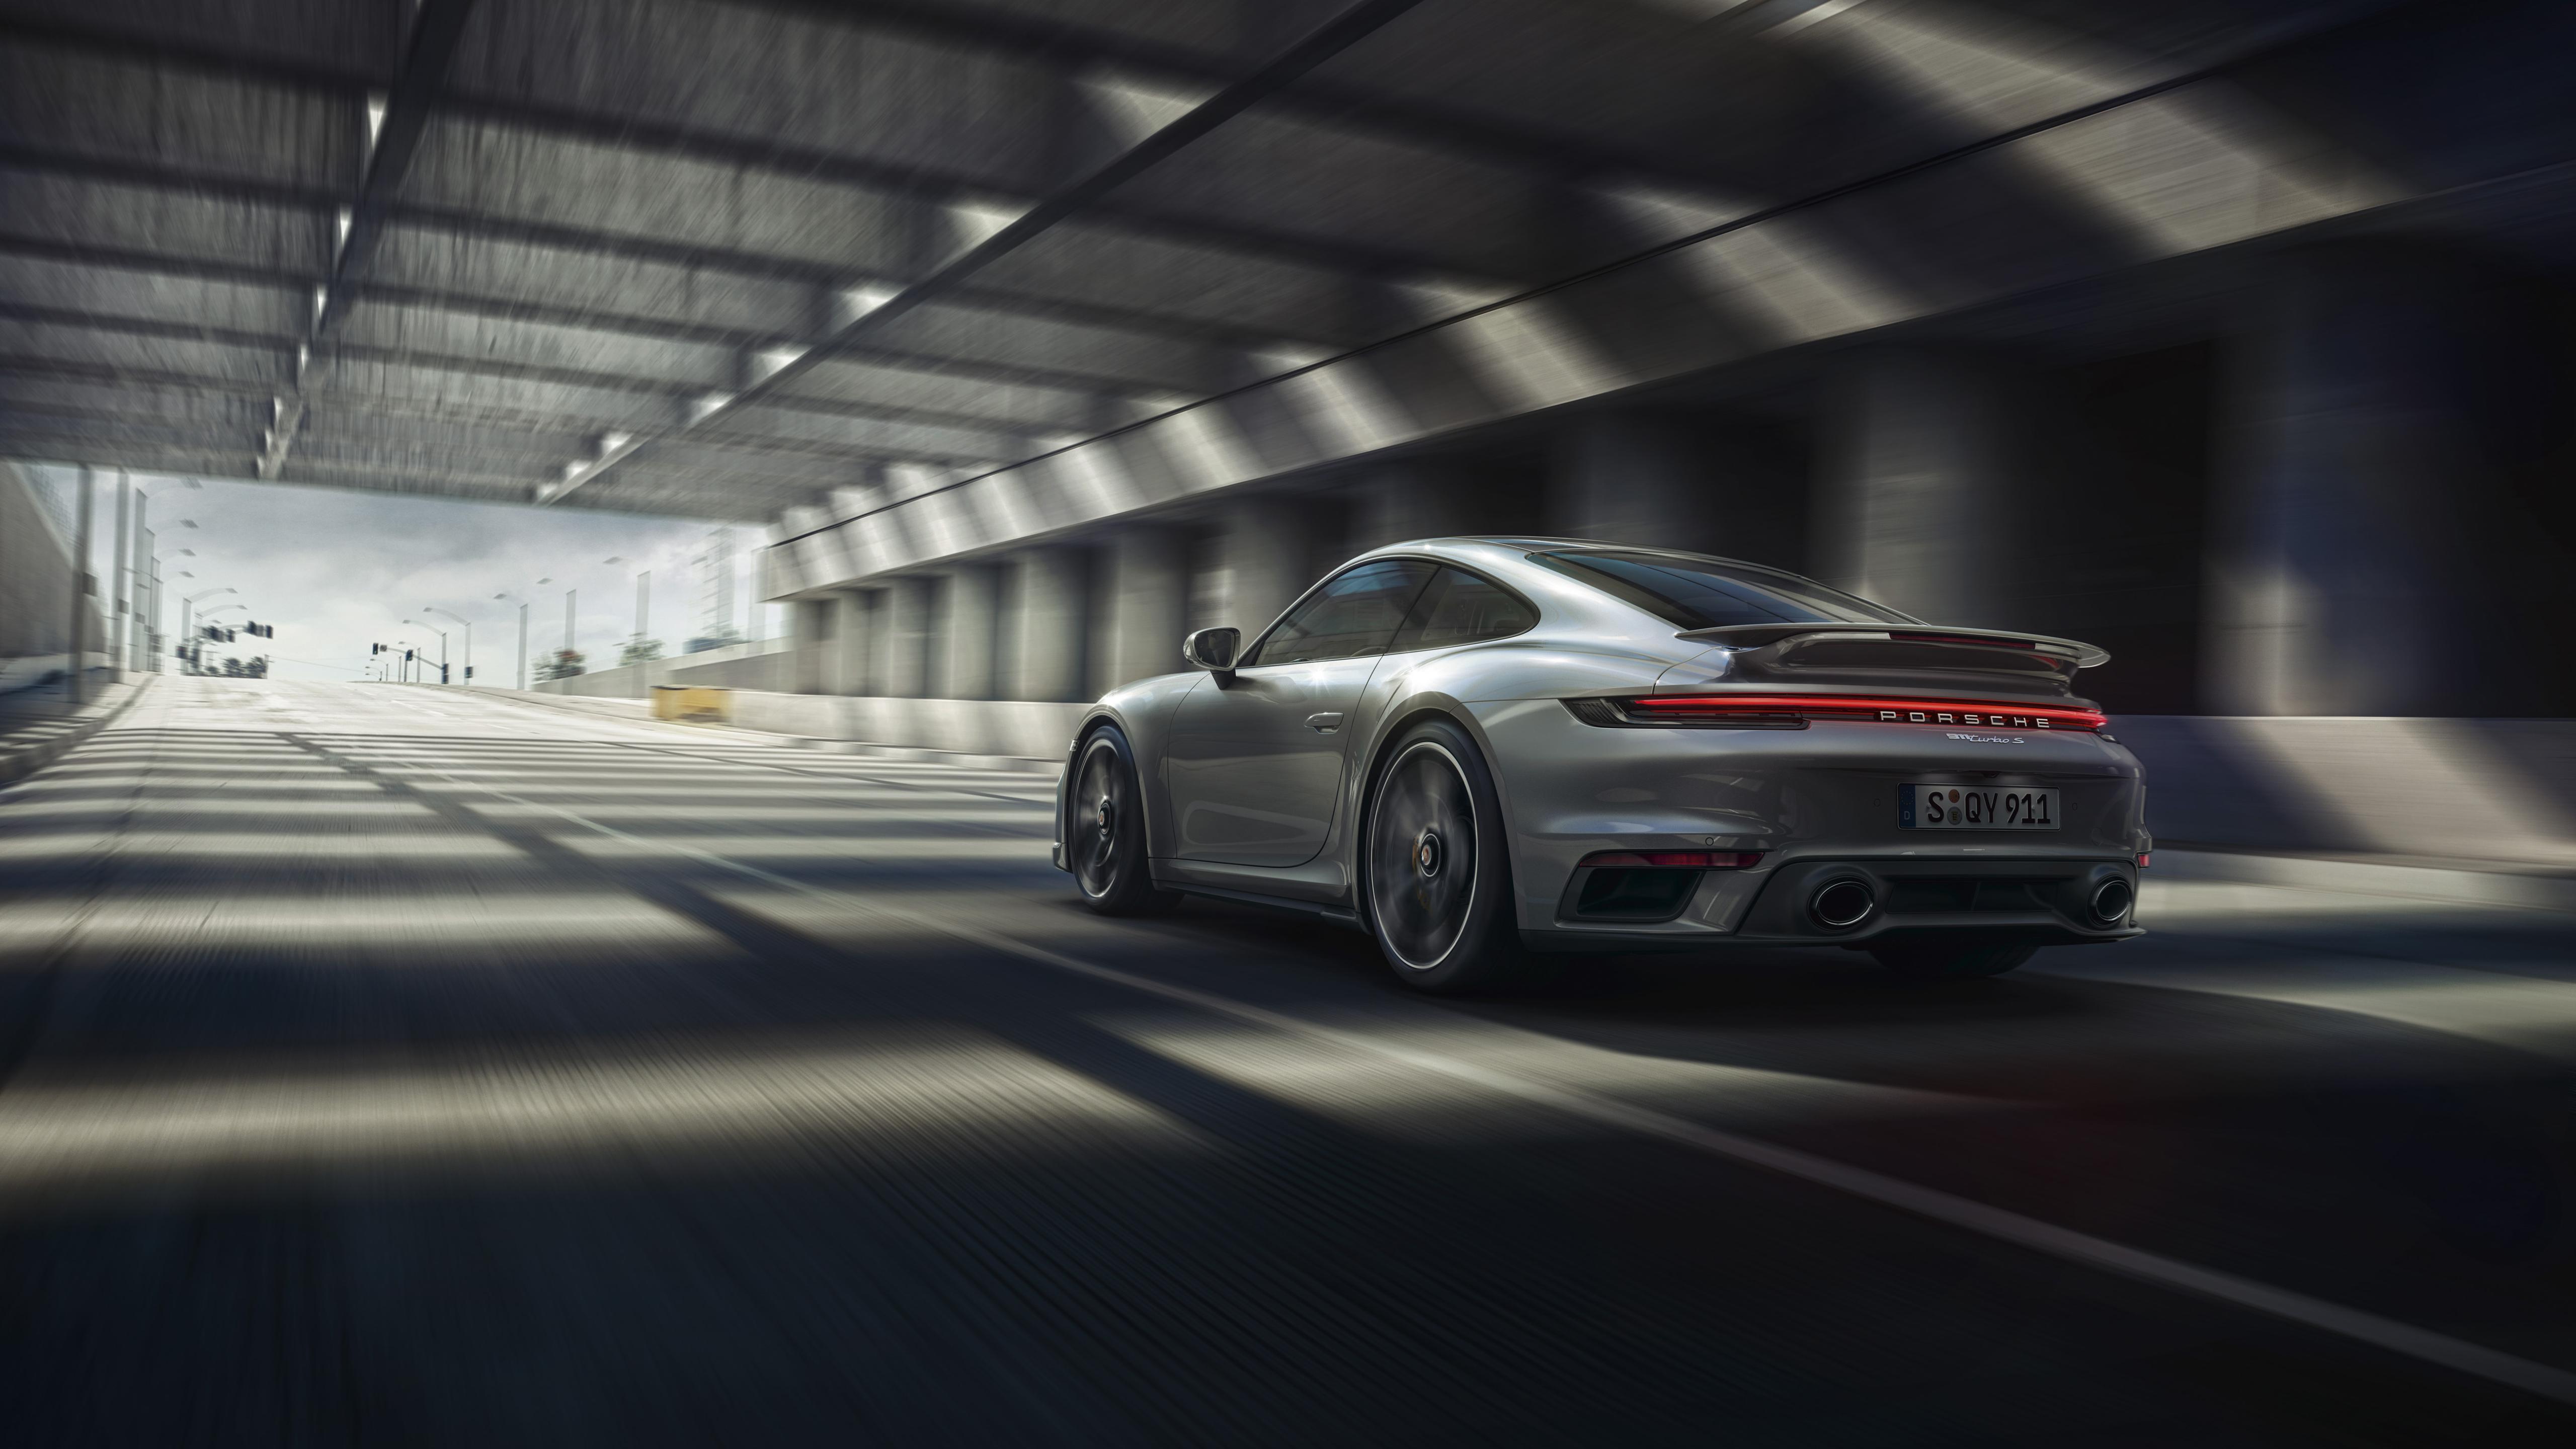 Porsche 911 Turbo S 2020 5k 4 Wallpaper Hd Car Wallpapers Id 14599